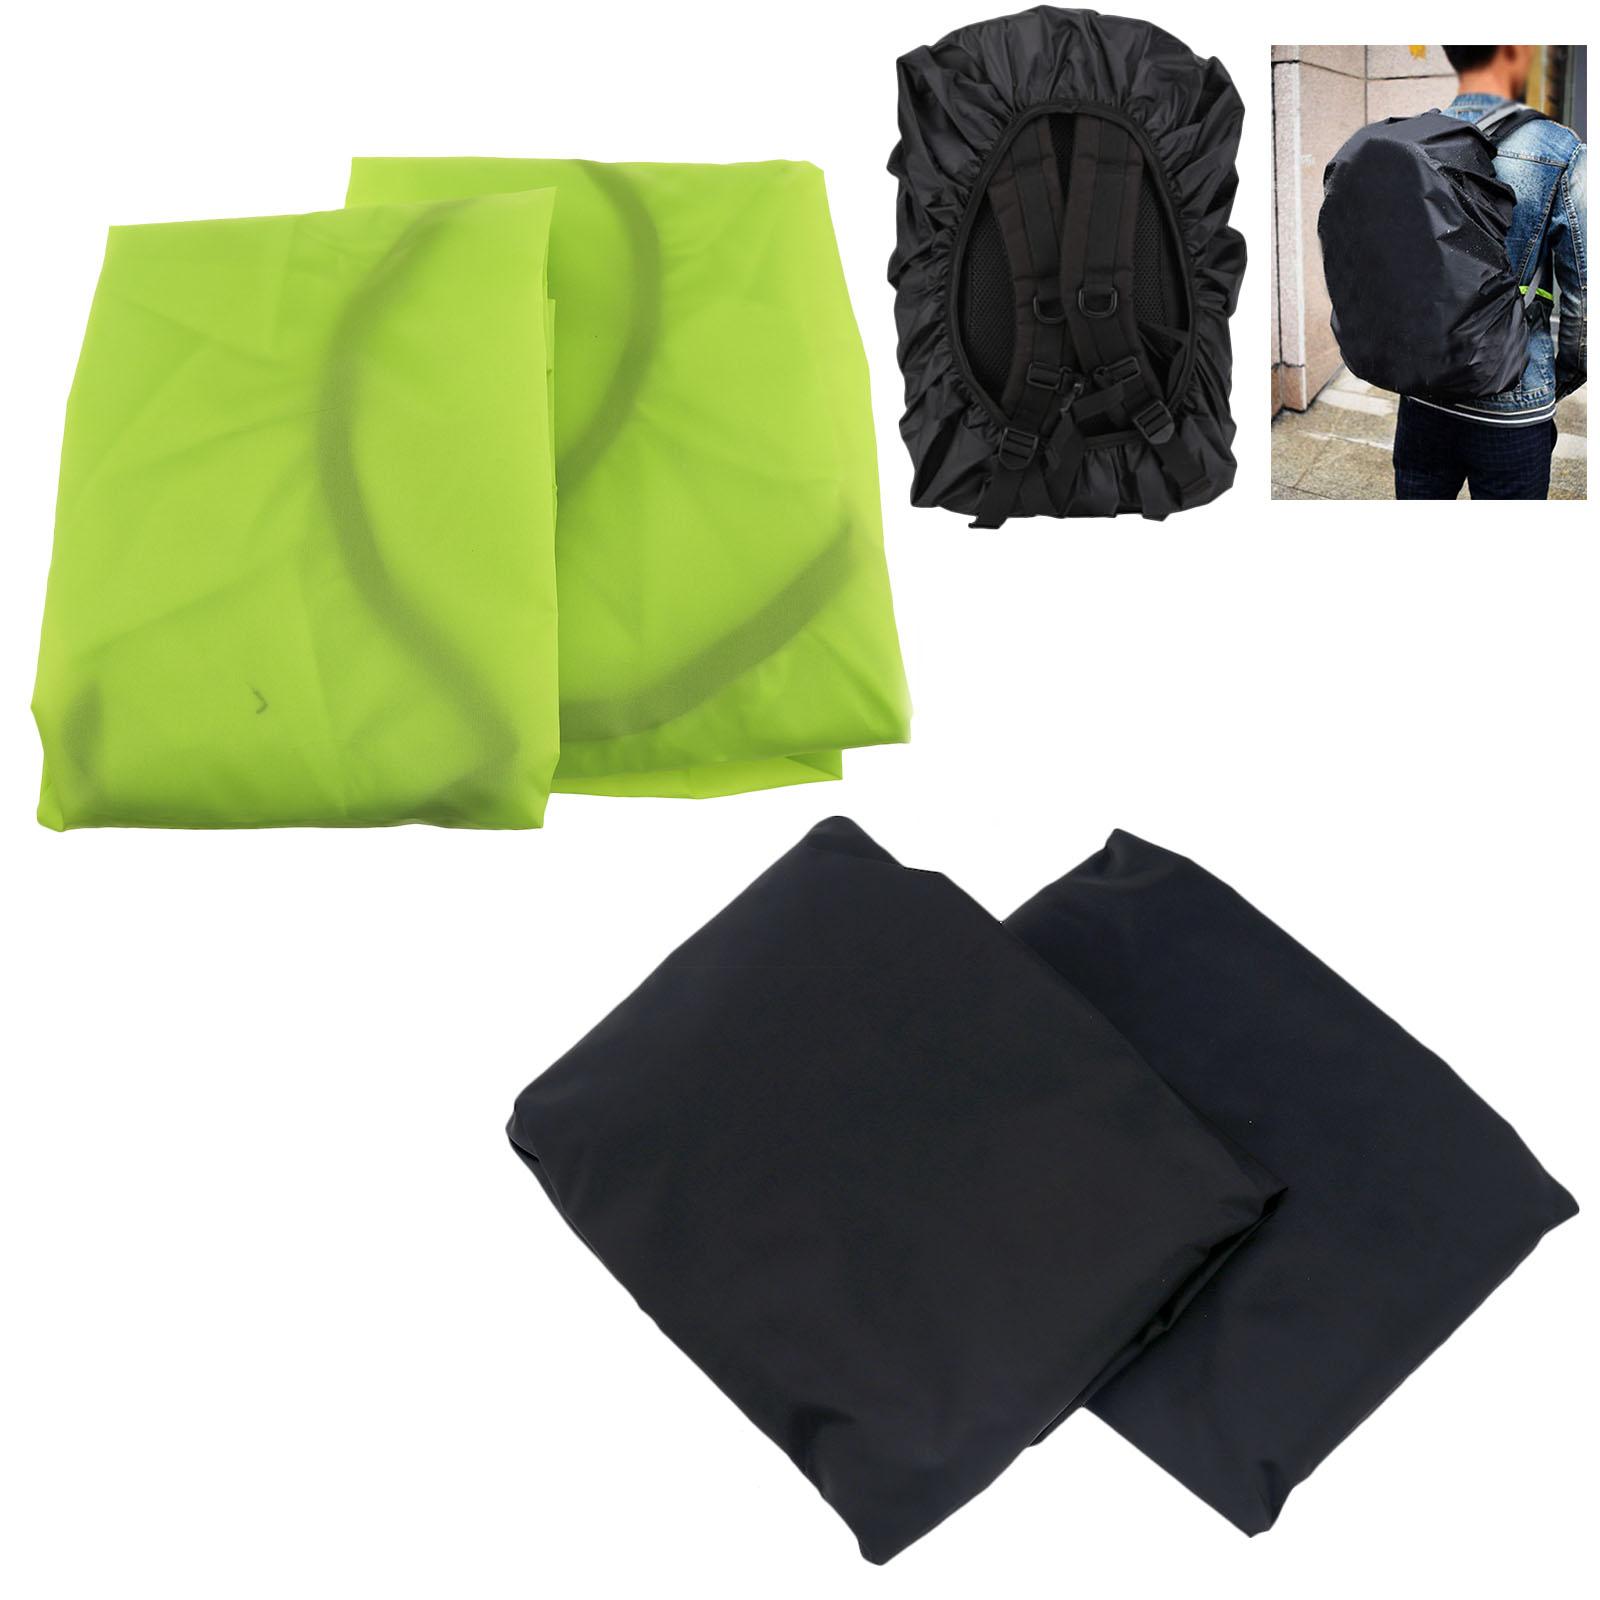 2x Wasserdicht Schulranzen Rucksack Regenhaube Regenschutz Regenhülle 30L-40L